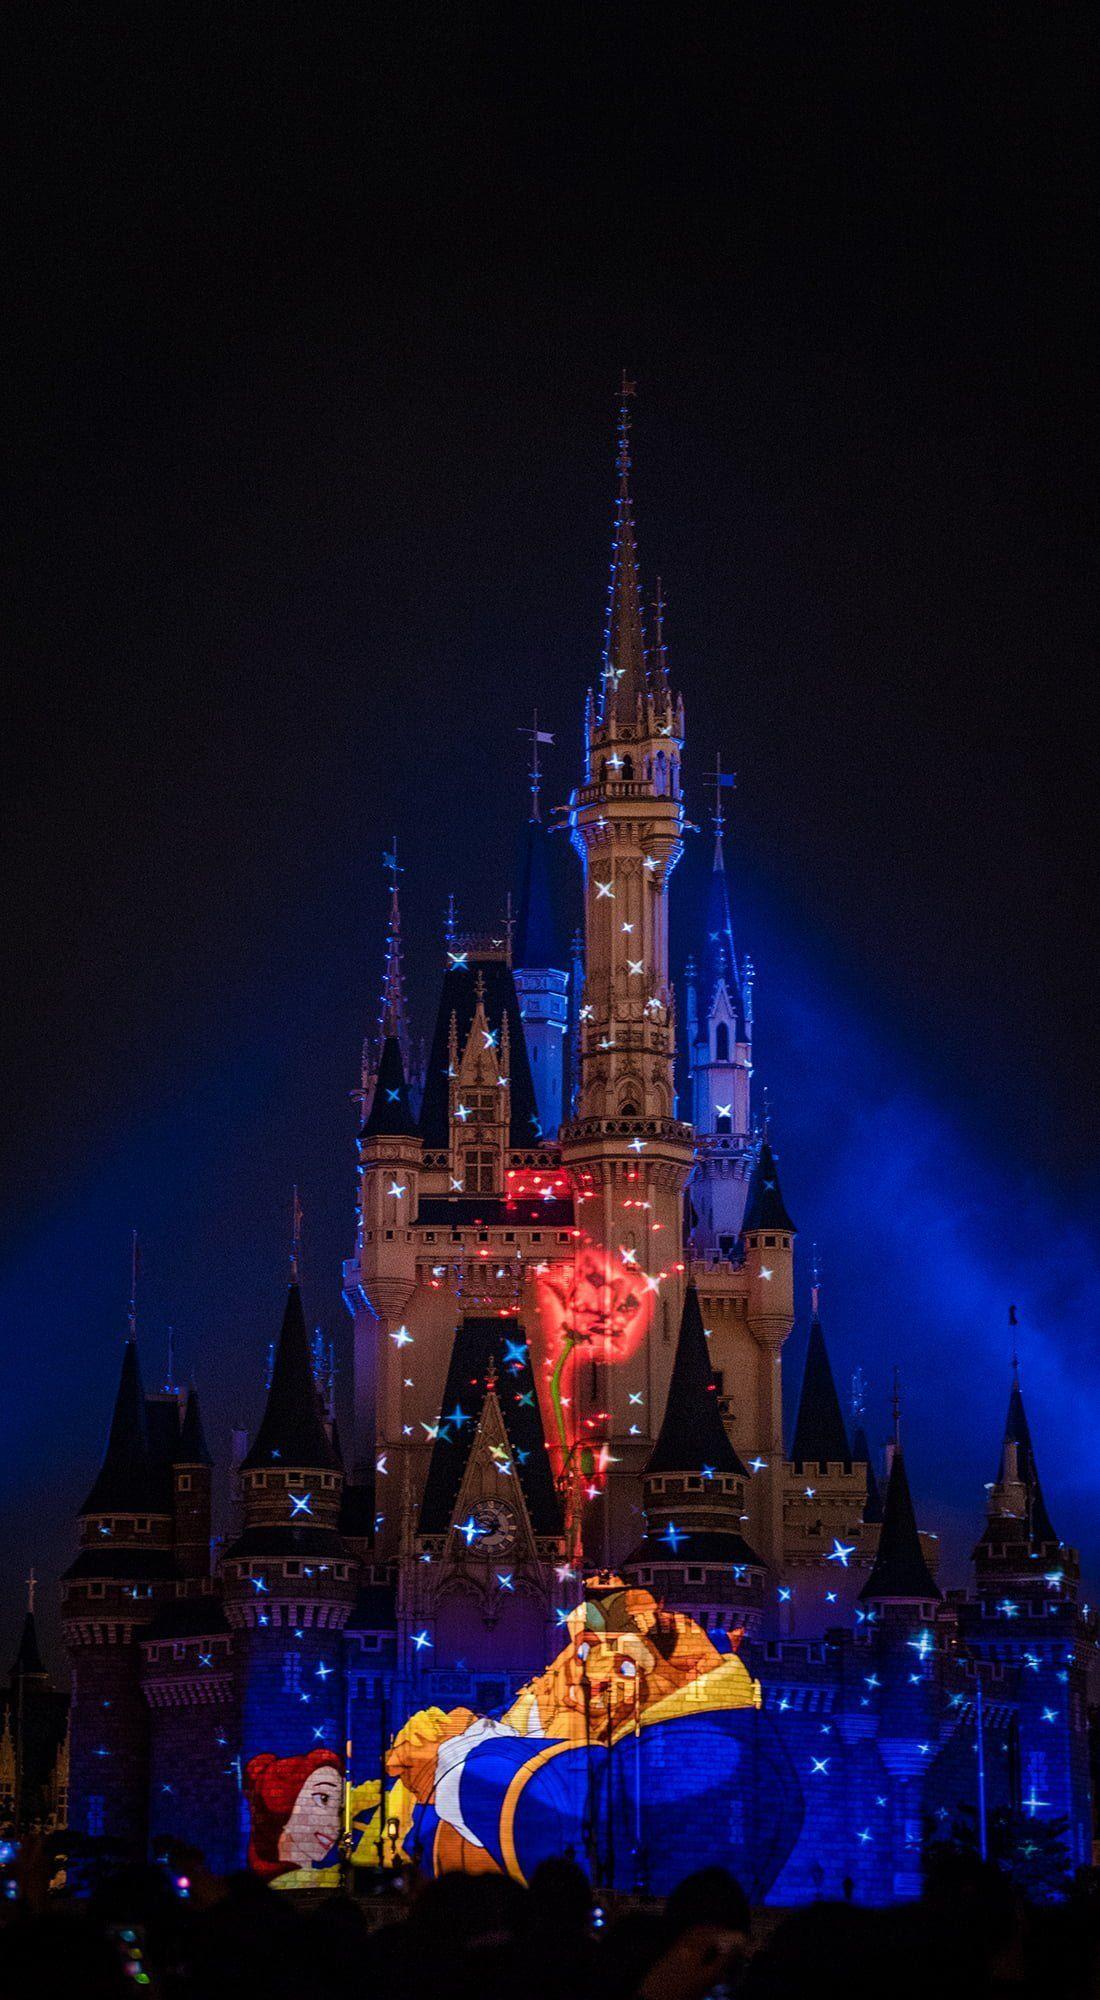 Disney Castle Desktop Wallpapers On Wallpaperdog